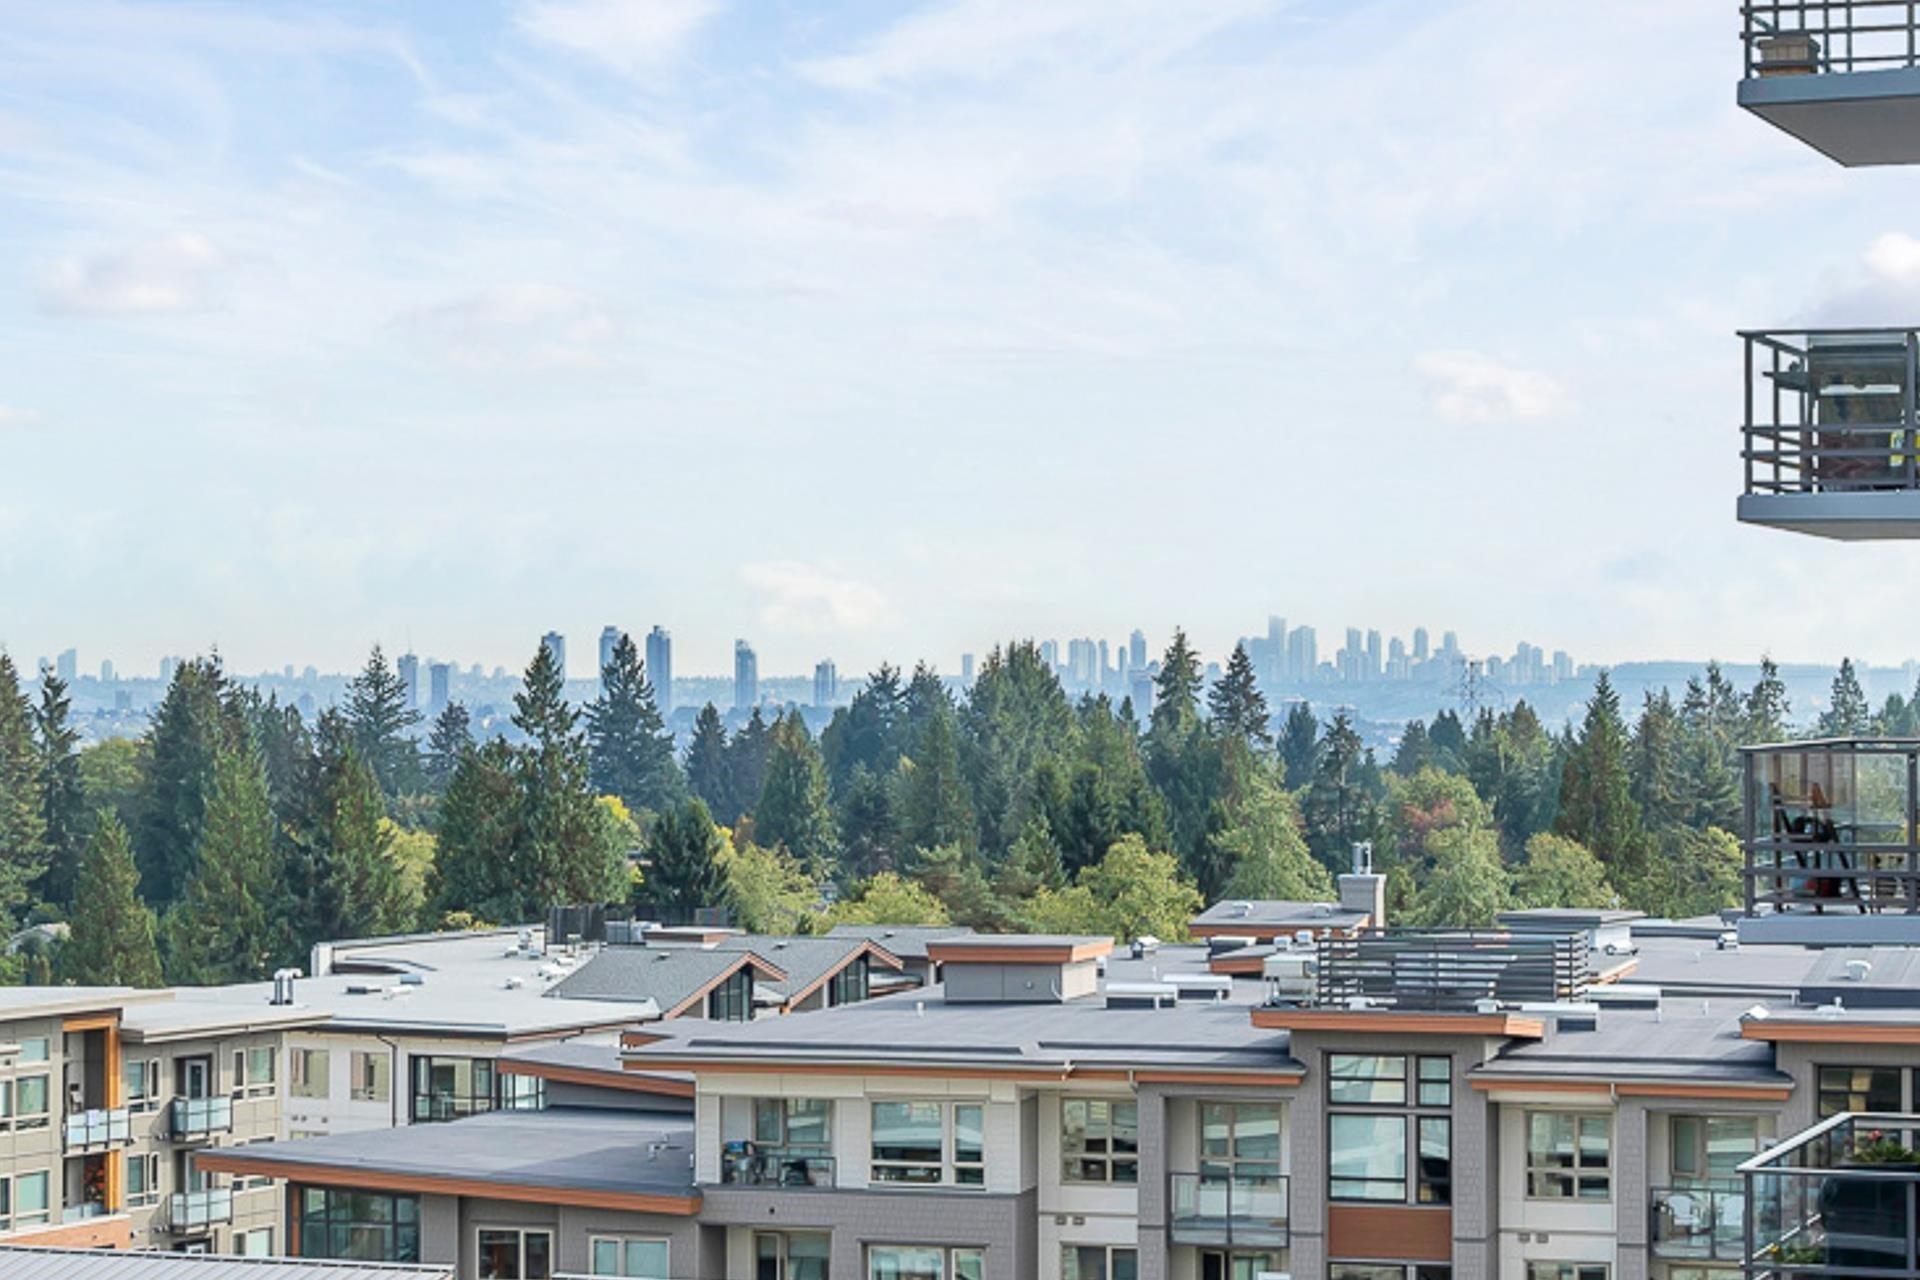 702 2780 VALLEY CENTRE AVENUE - Lynn Valley Apartment/Condo for sale, 3 Bedrooms (R2622279) - #28